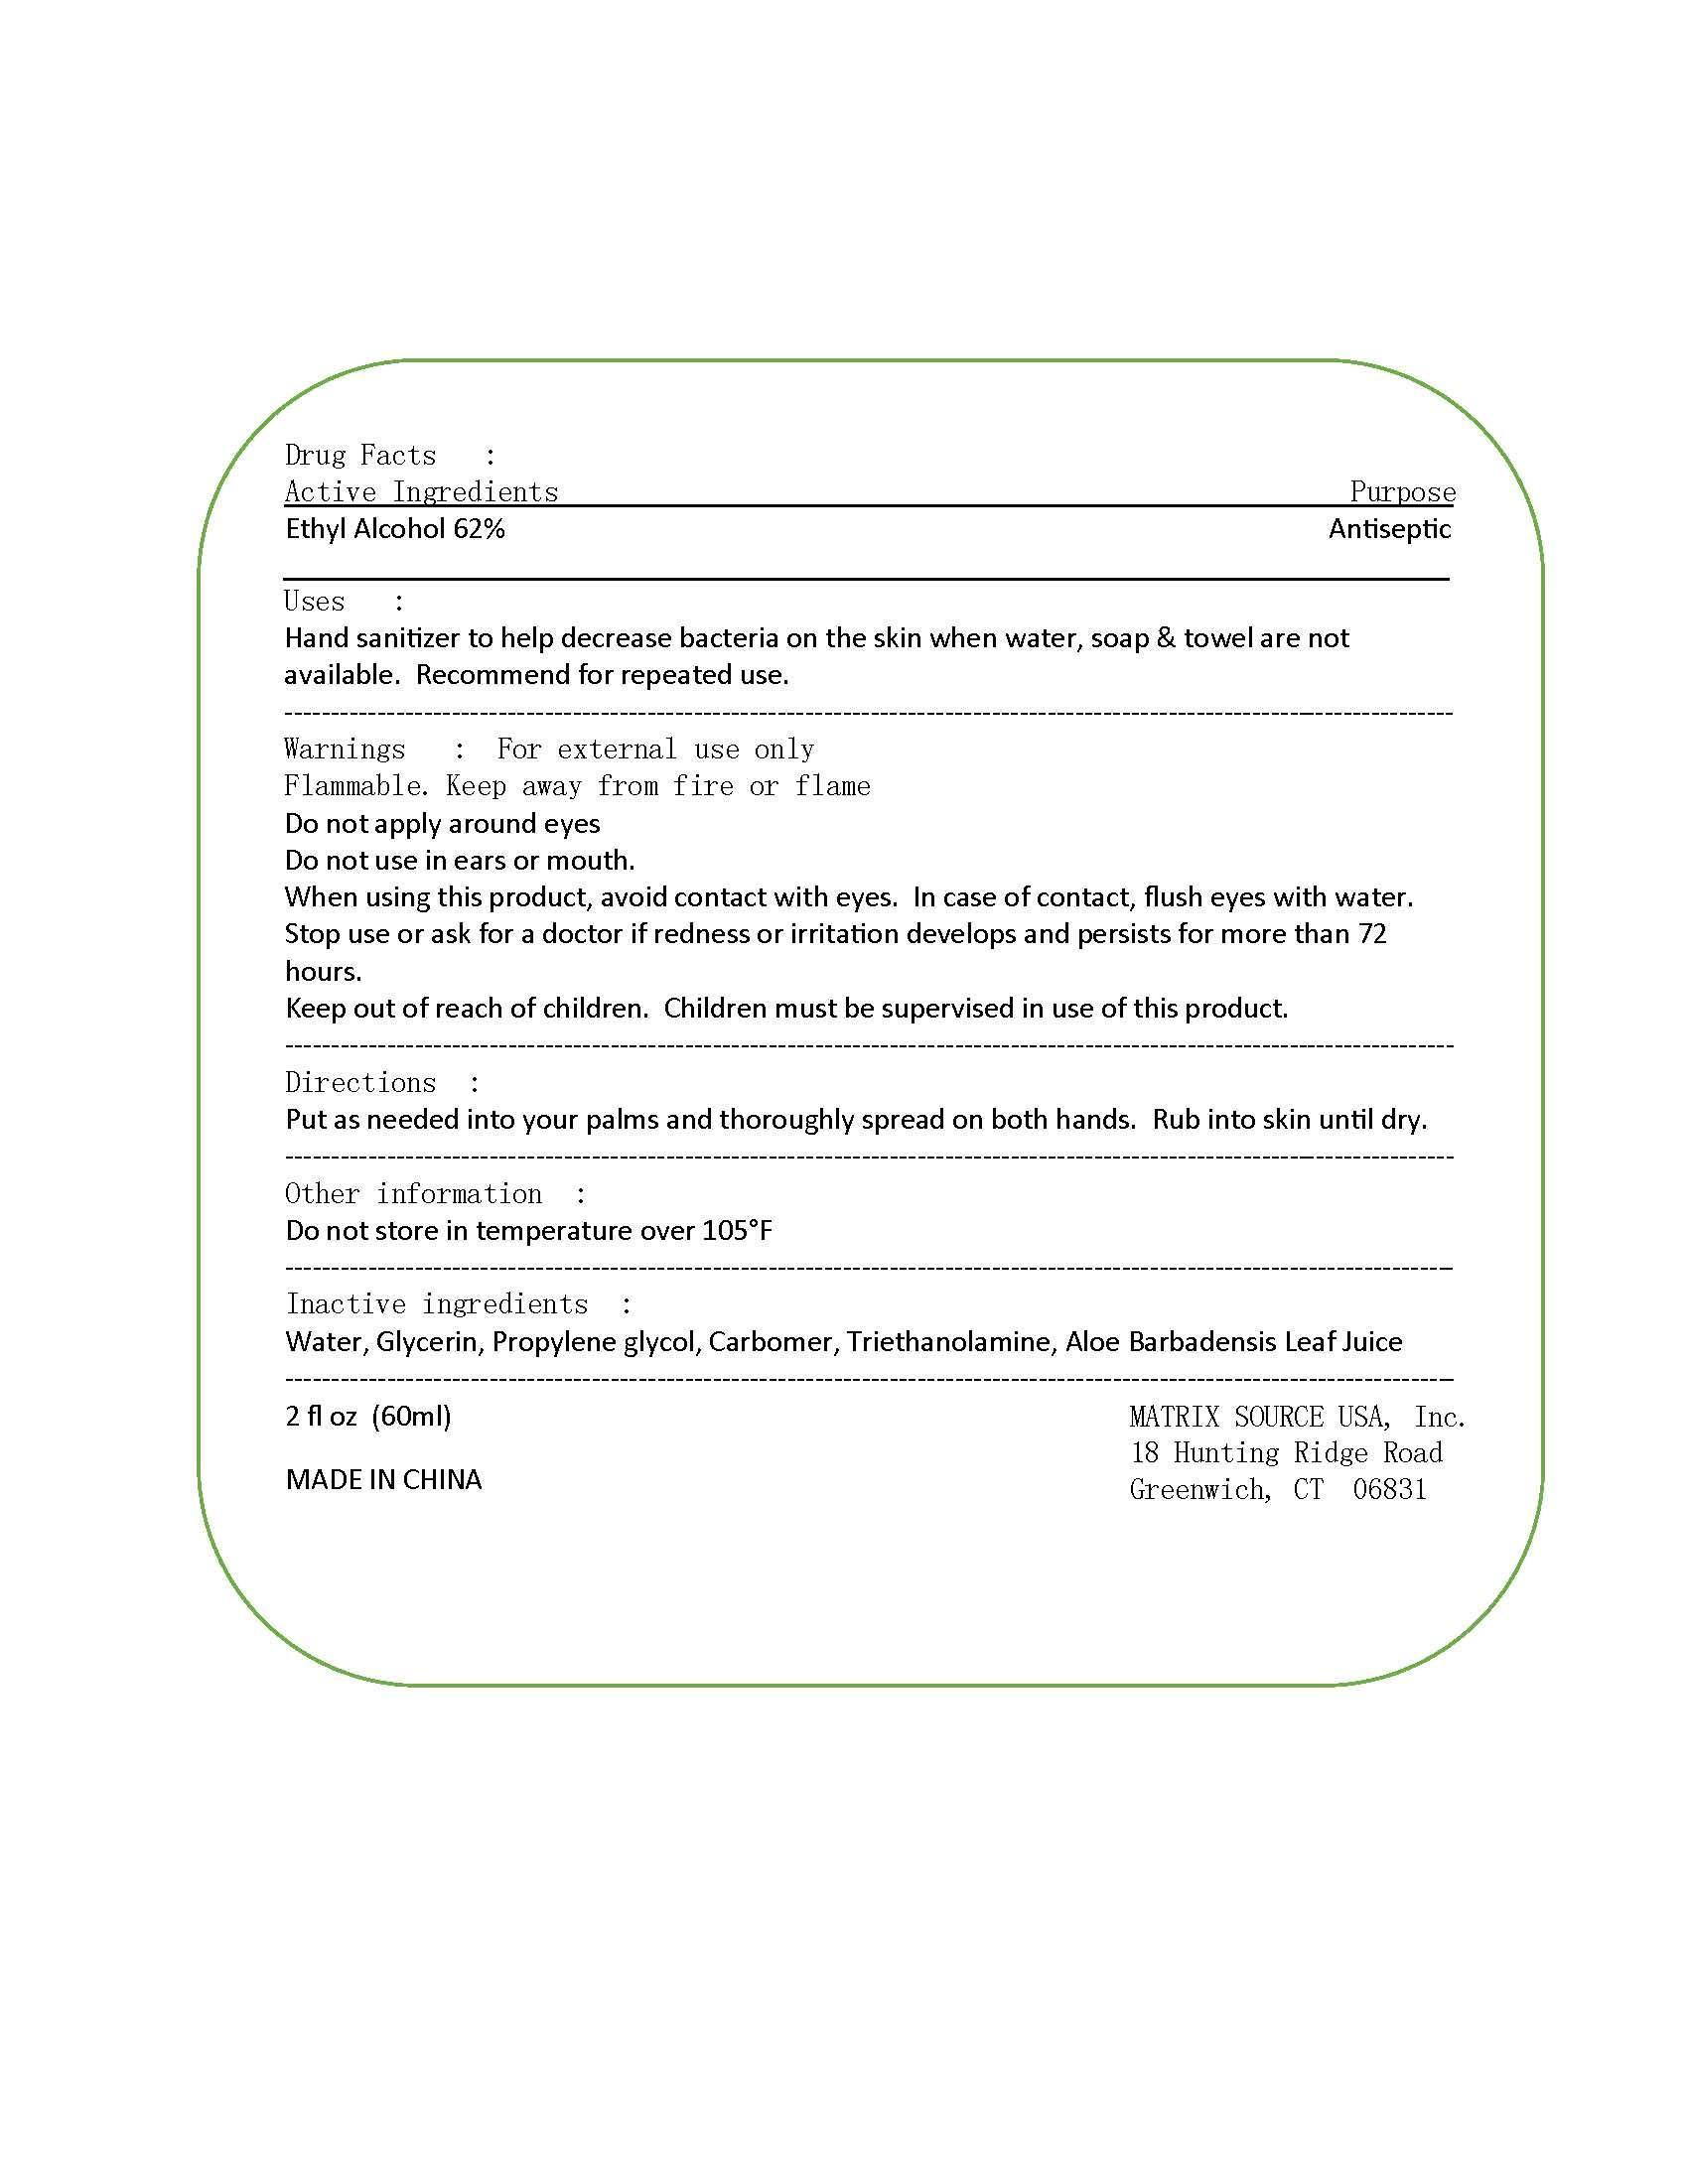 Hand Sanitizer (Ethyl Alcohol) Gel [Matrix Source Usa, Inc]